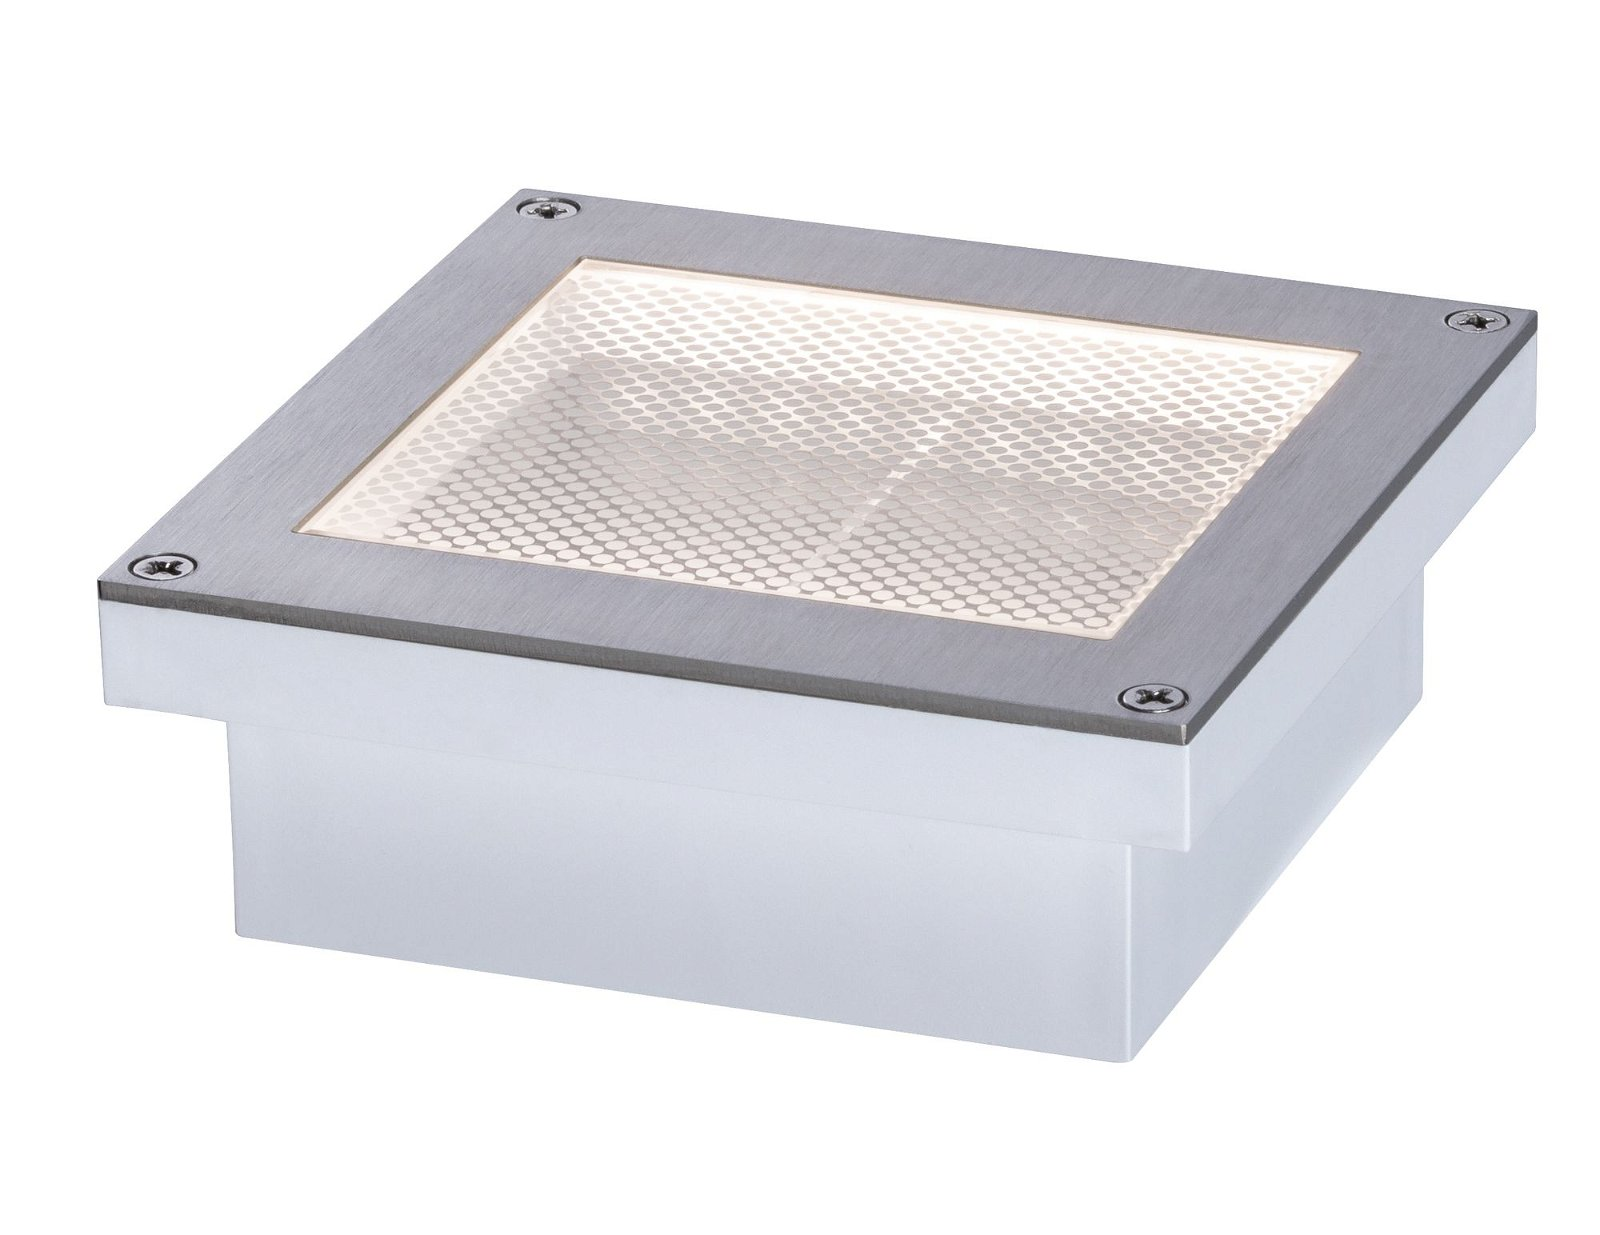 Solar LED-grondinbouwlamp Aron Bewegingsmelder IP67 3000K 50lm Wit